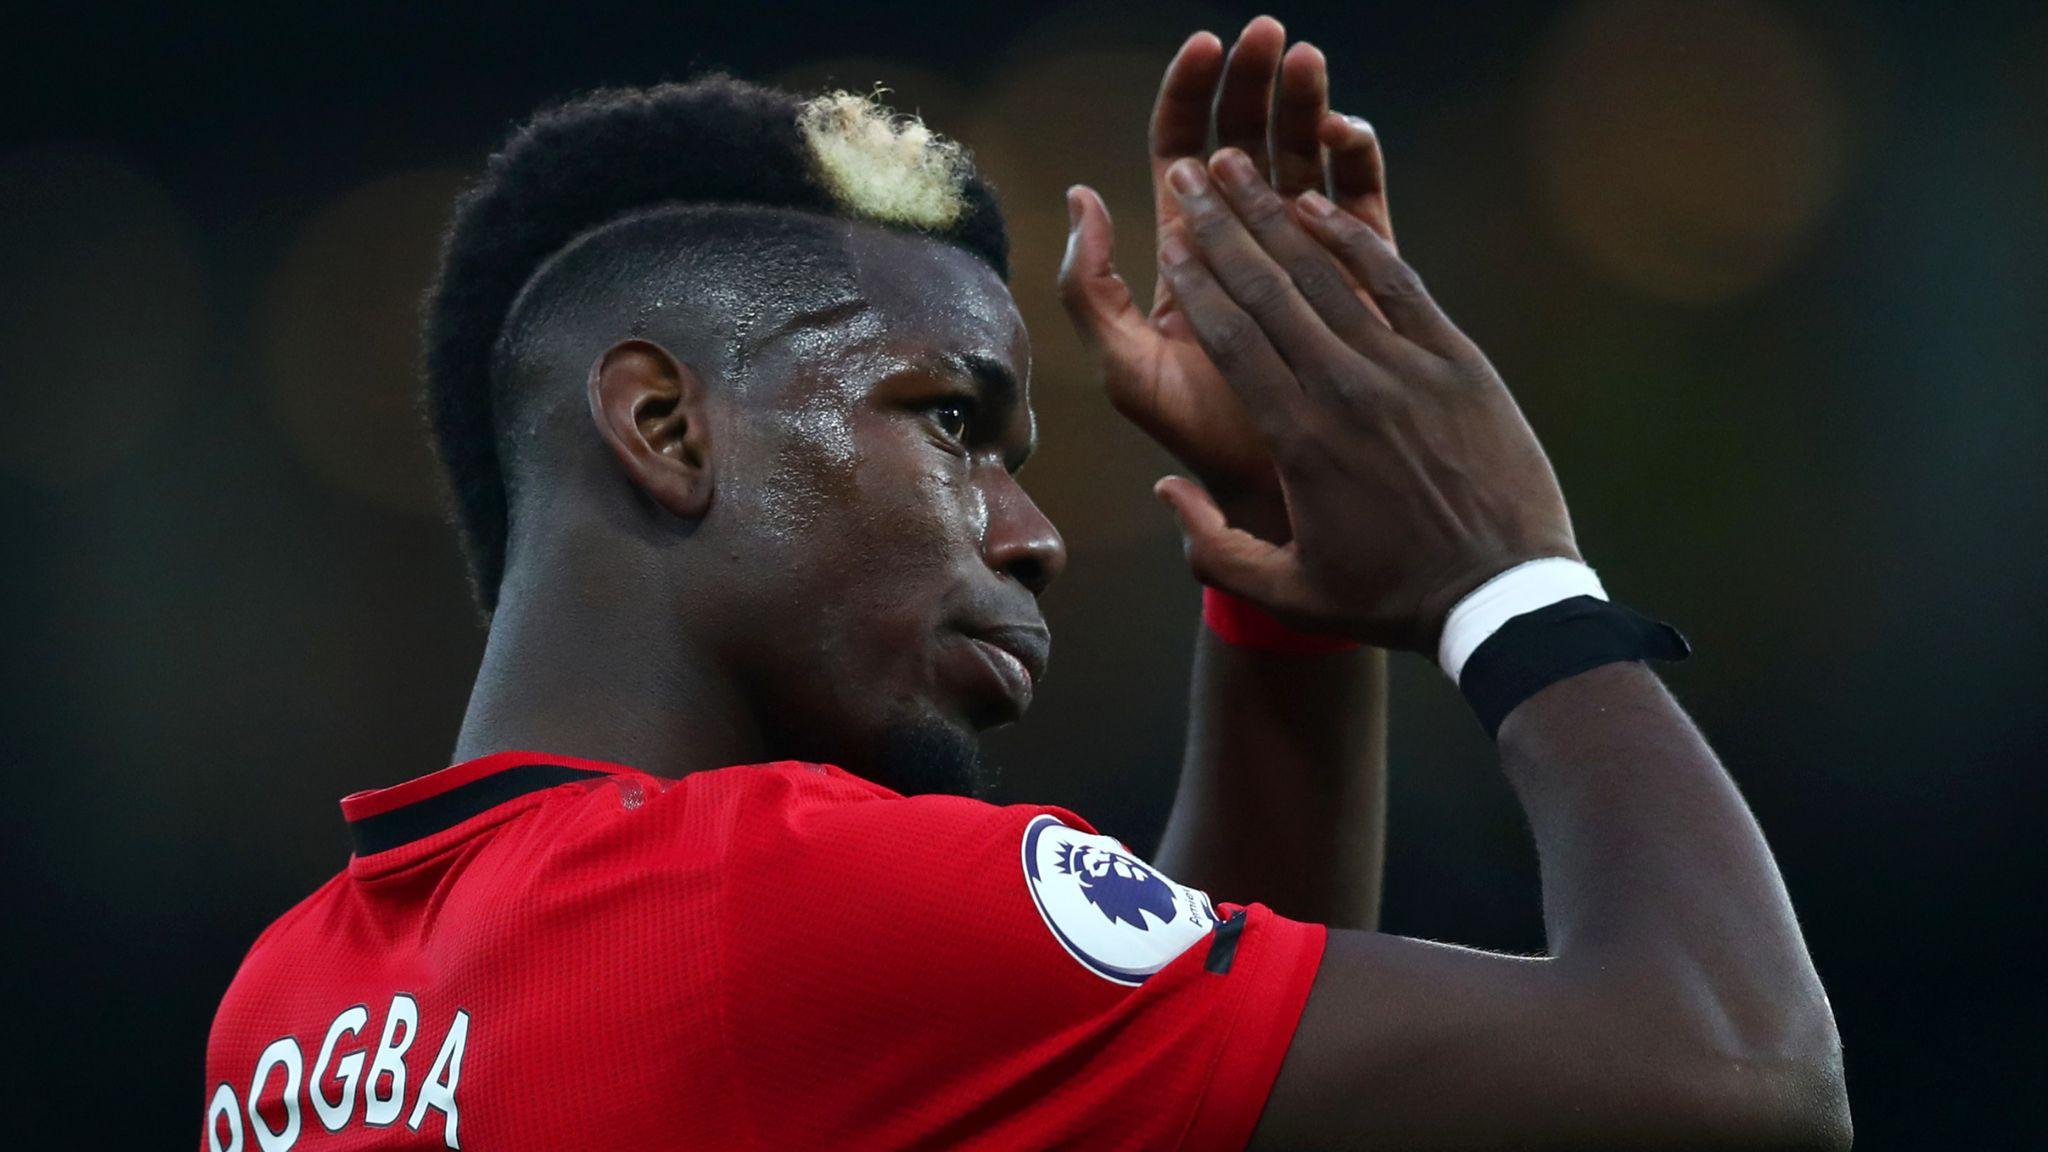 Jose Mourinho and Tottenham should sit tight, says Harry Redknapp